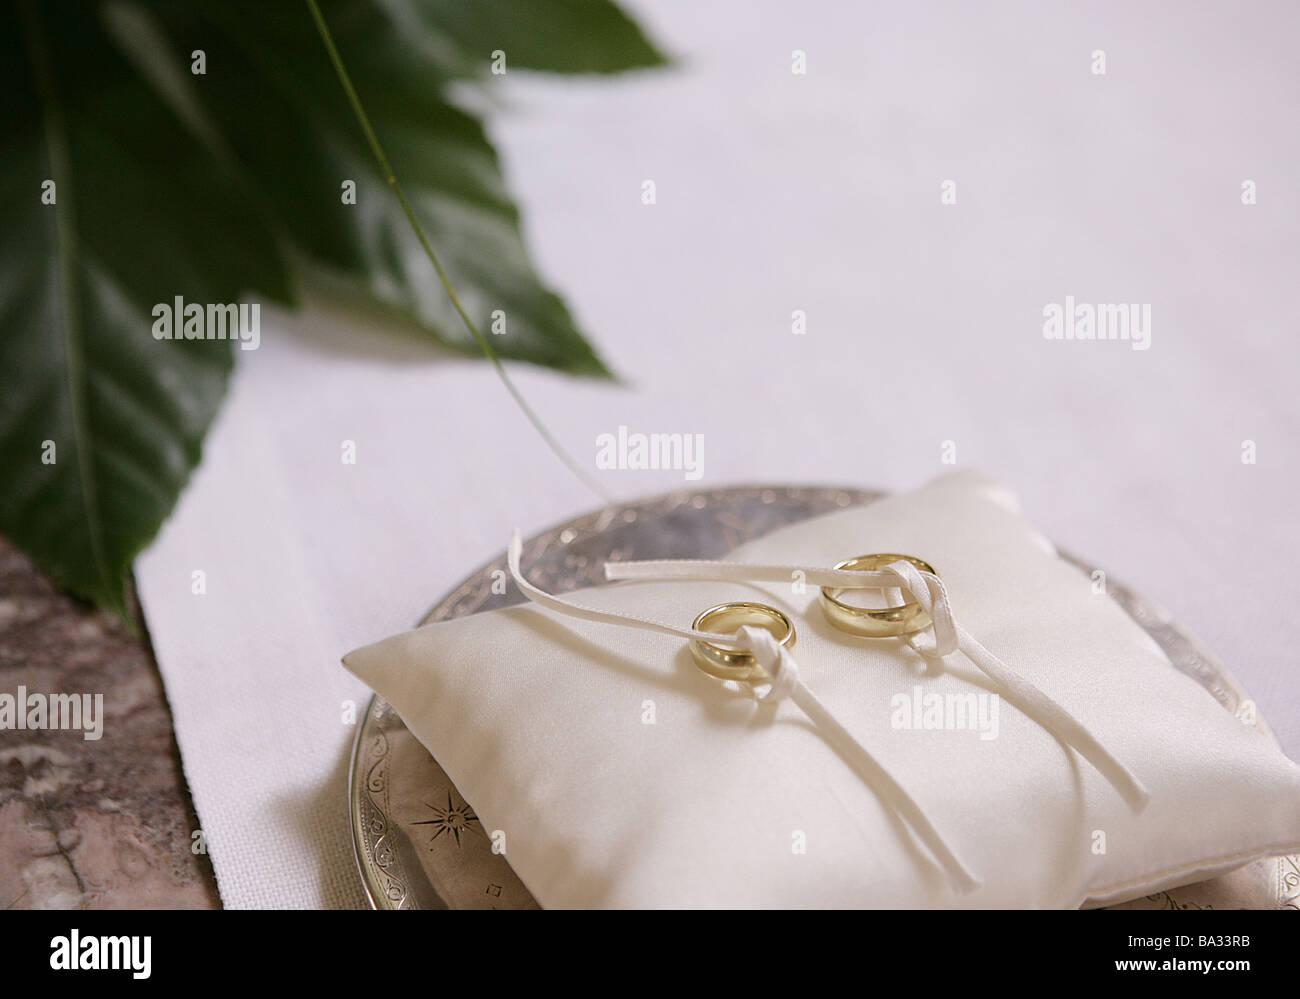 Bald Inge Ring Kissen Tablett Detail Ringe Trauringe Hochzeit Symbol